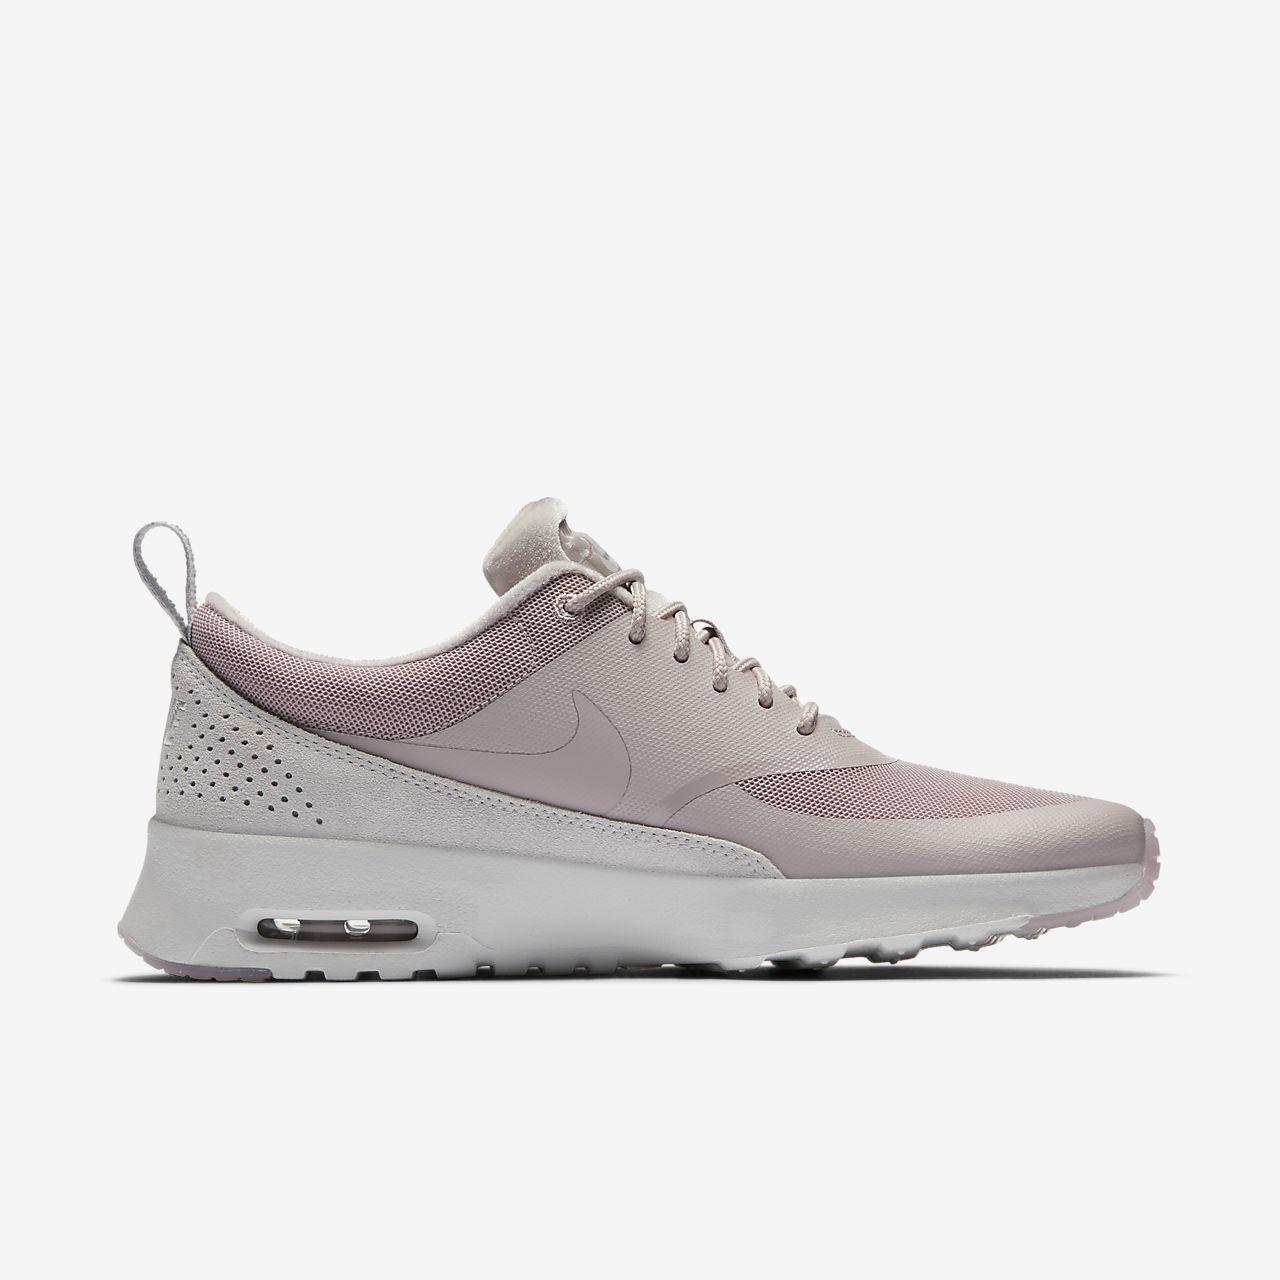 Wmns Nike Air Max Thea - Chaussures De Sport Pour Femmes / Rose Nike rIWwC2yt3r